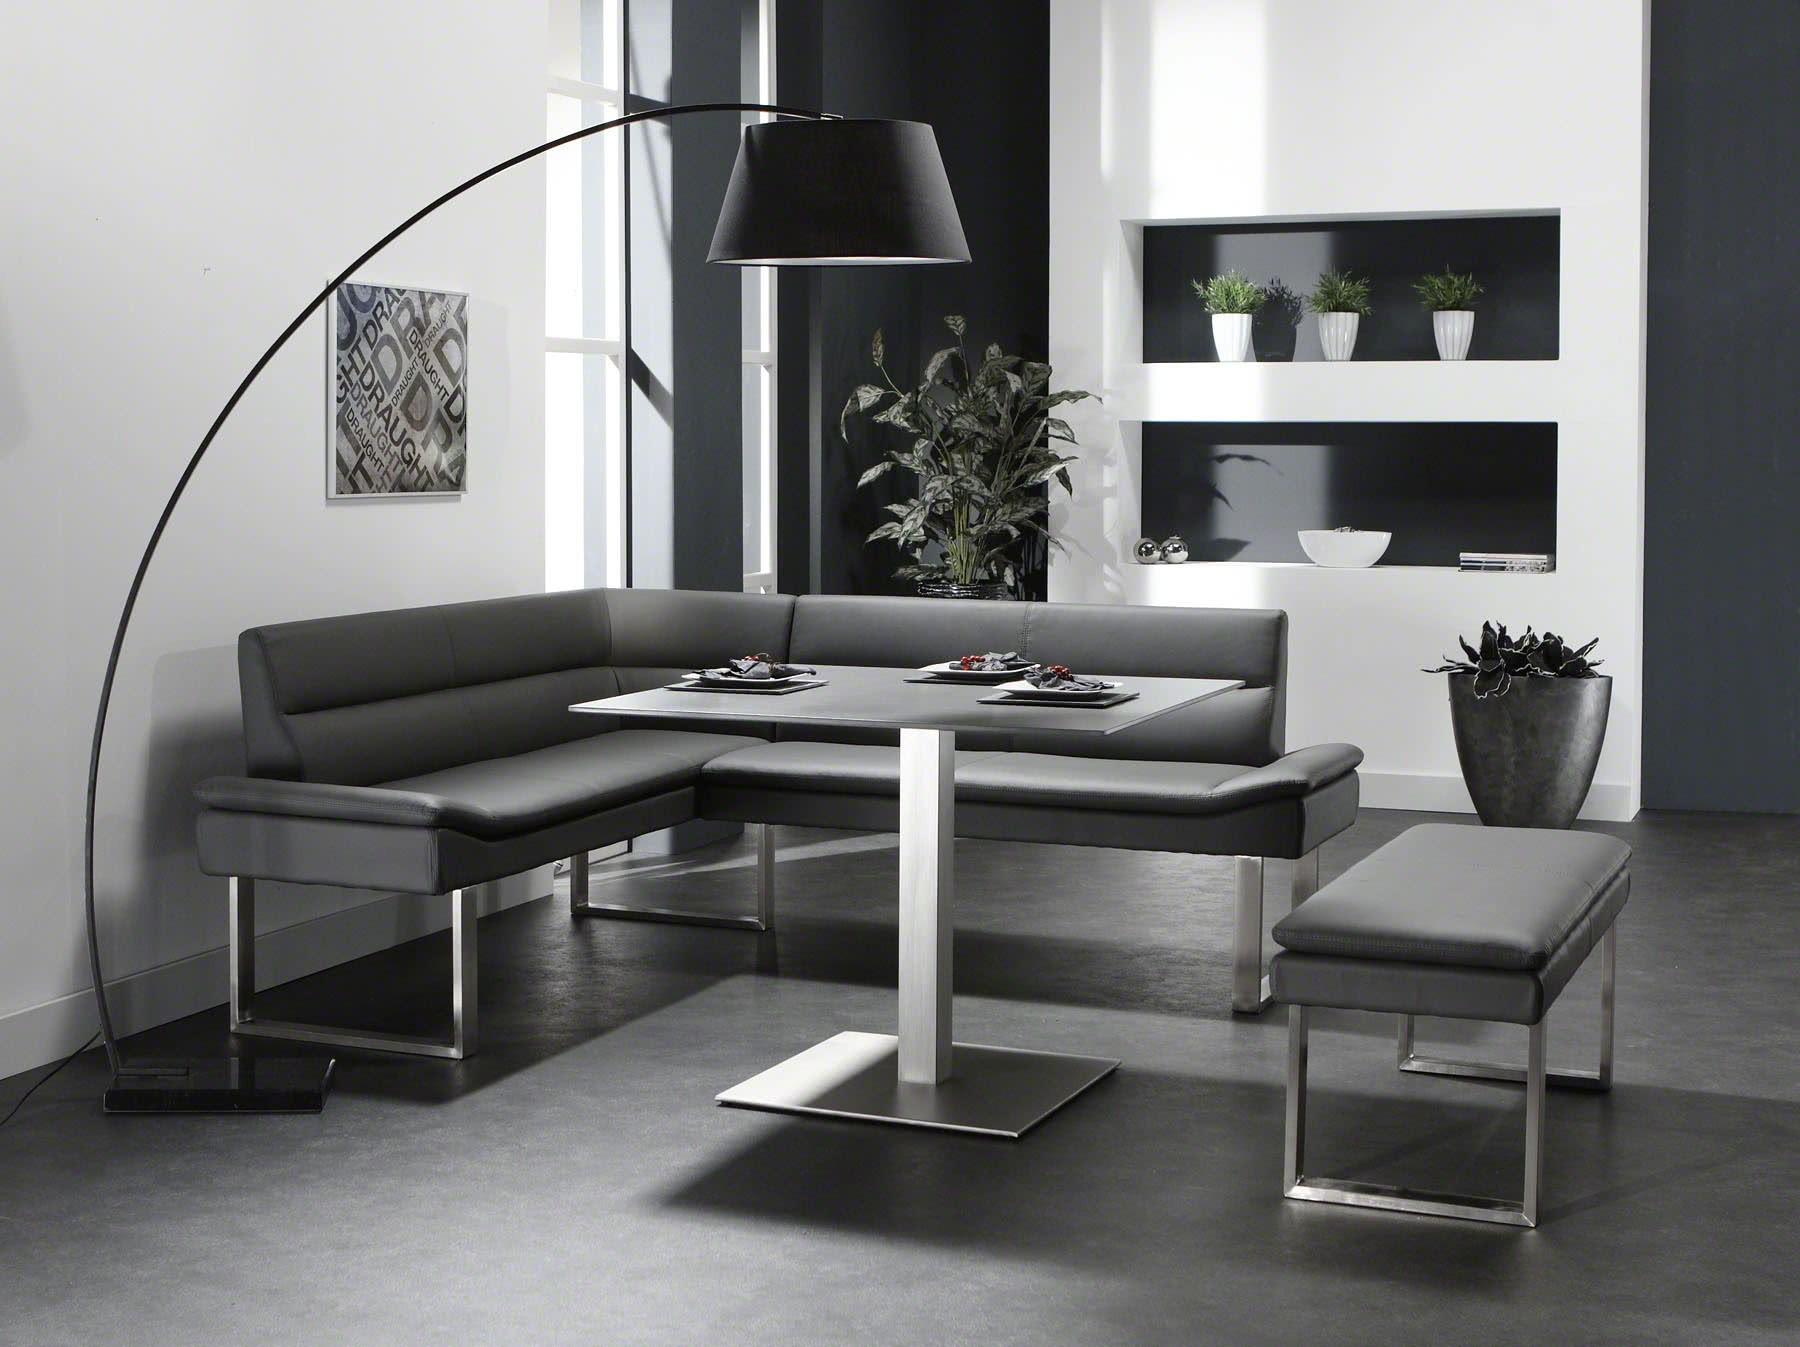 lampadaire arc classique en tissu noir zivina. Black Bedroom Furniture Sets. Home Design Ideas